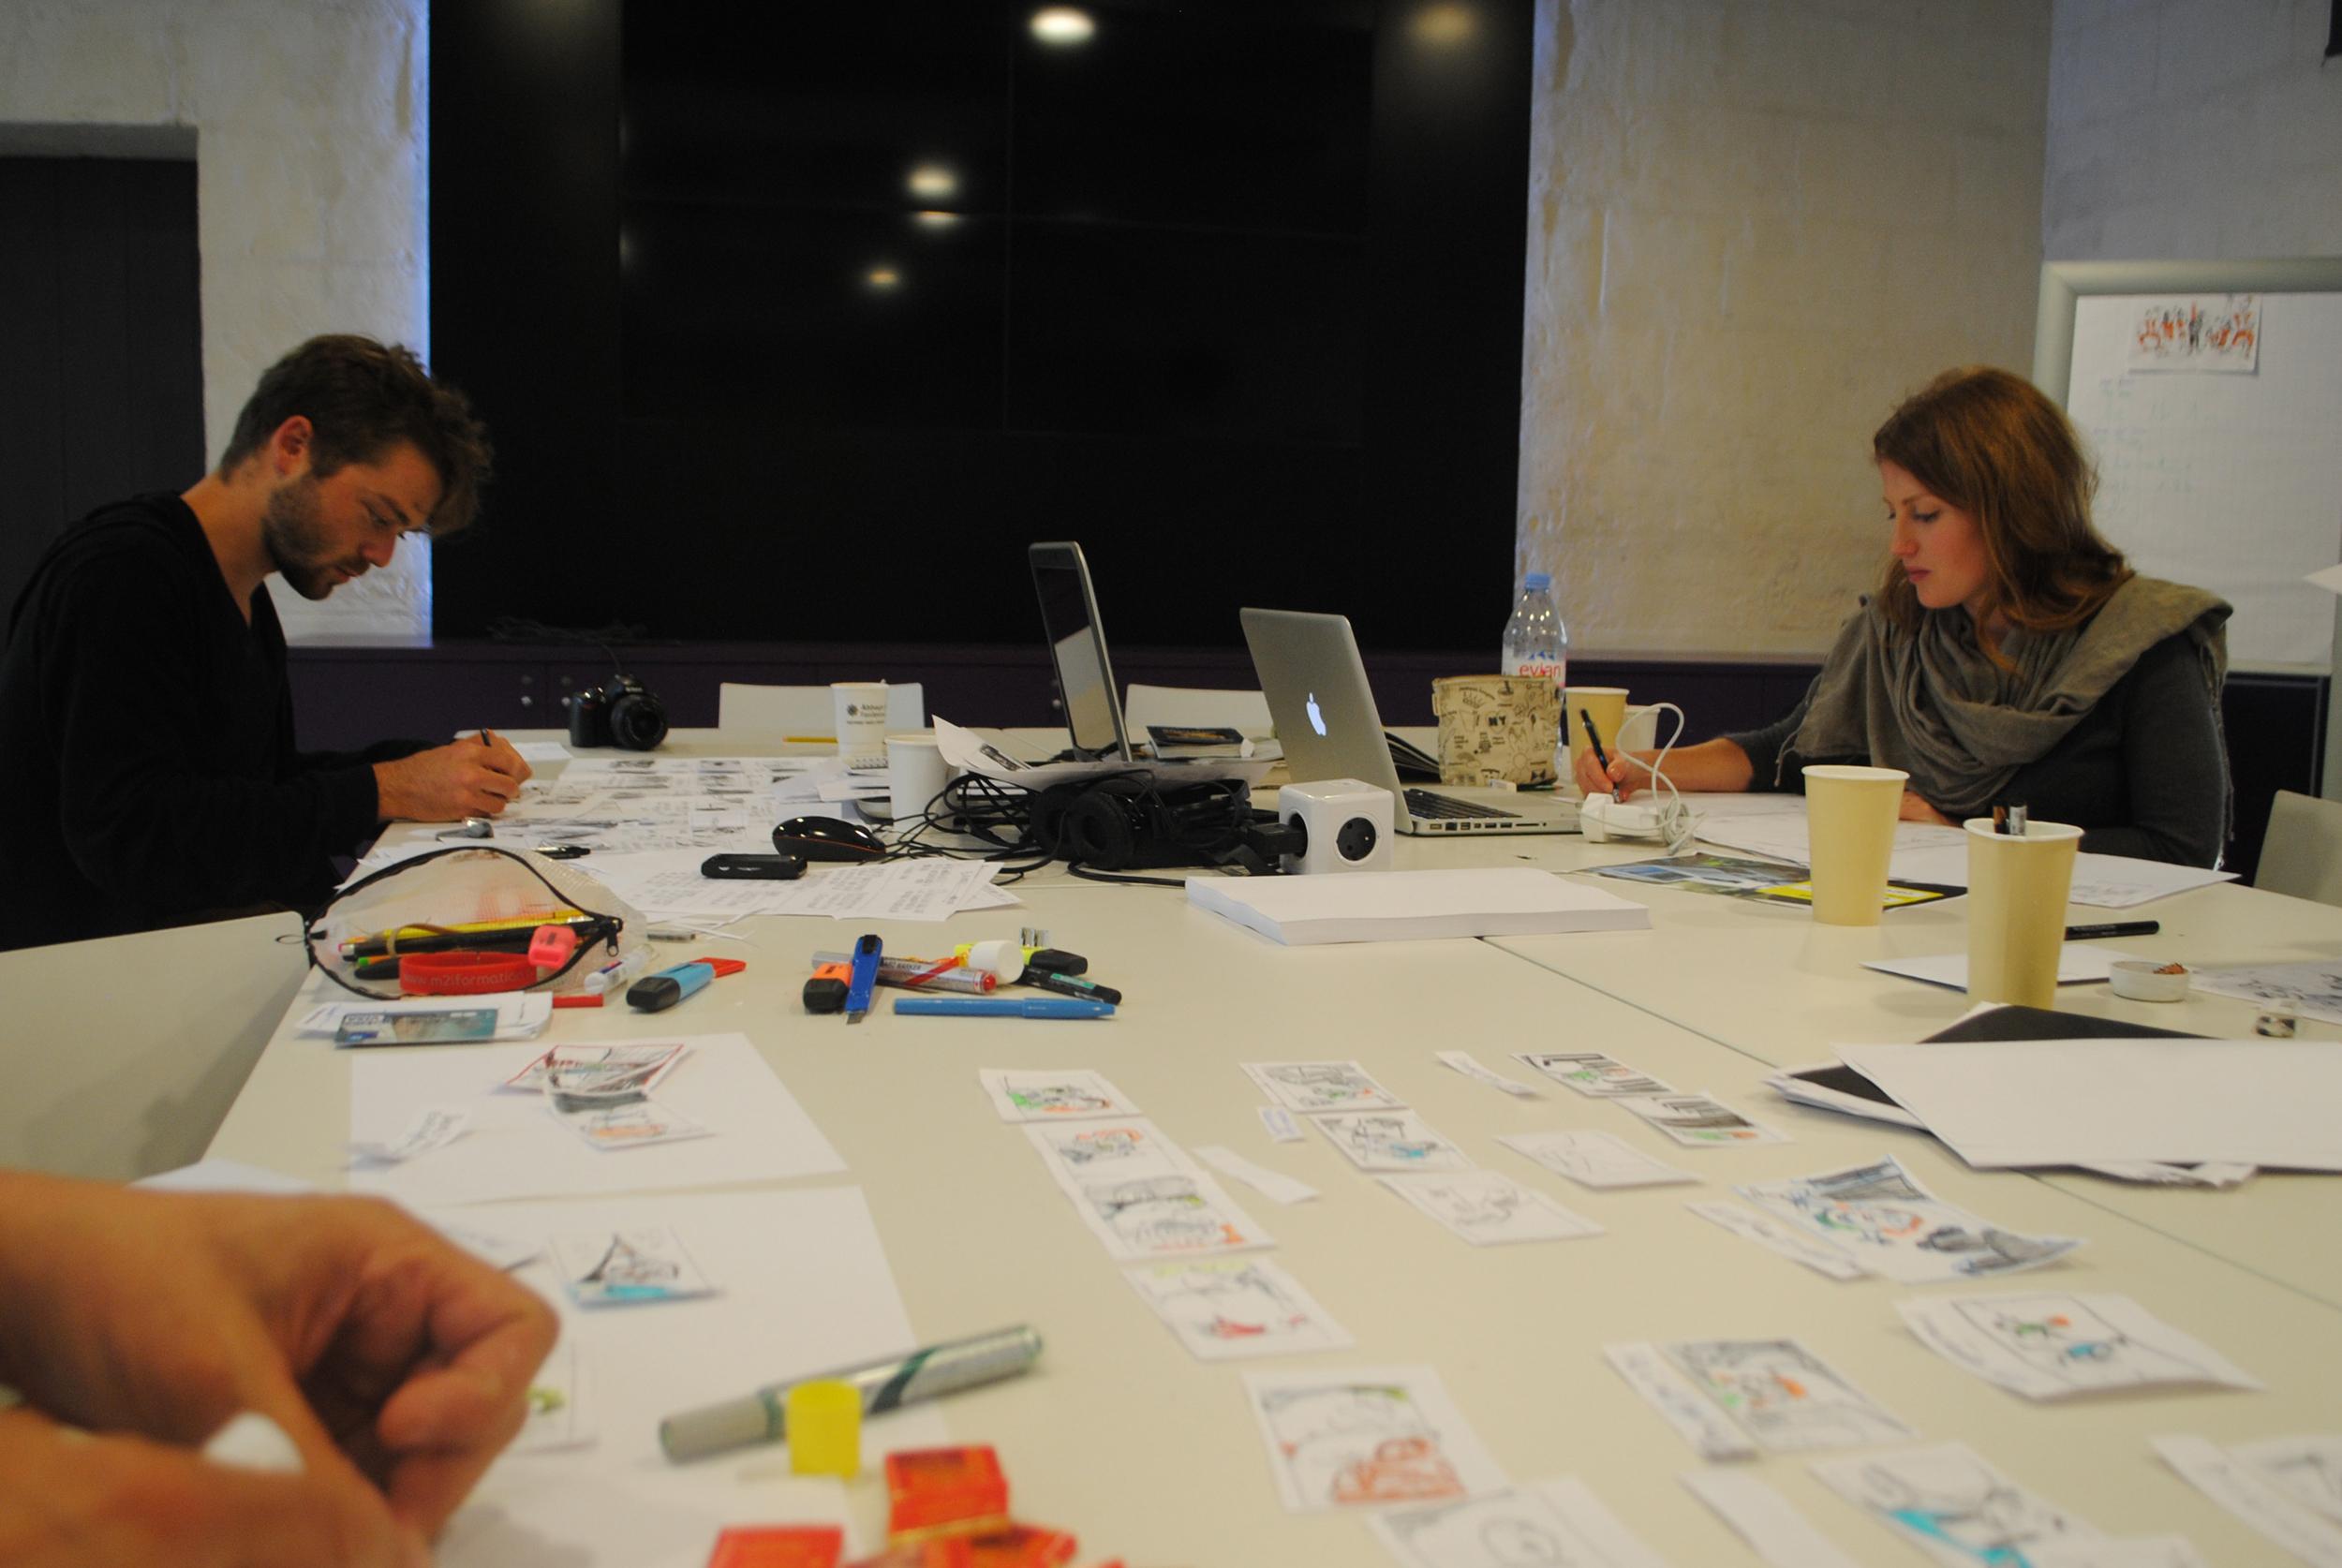 Emmanuel Morin captures Antoine and I working hard on our storyboards.